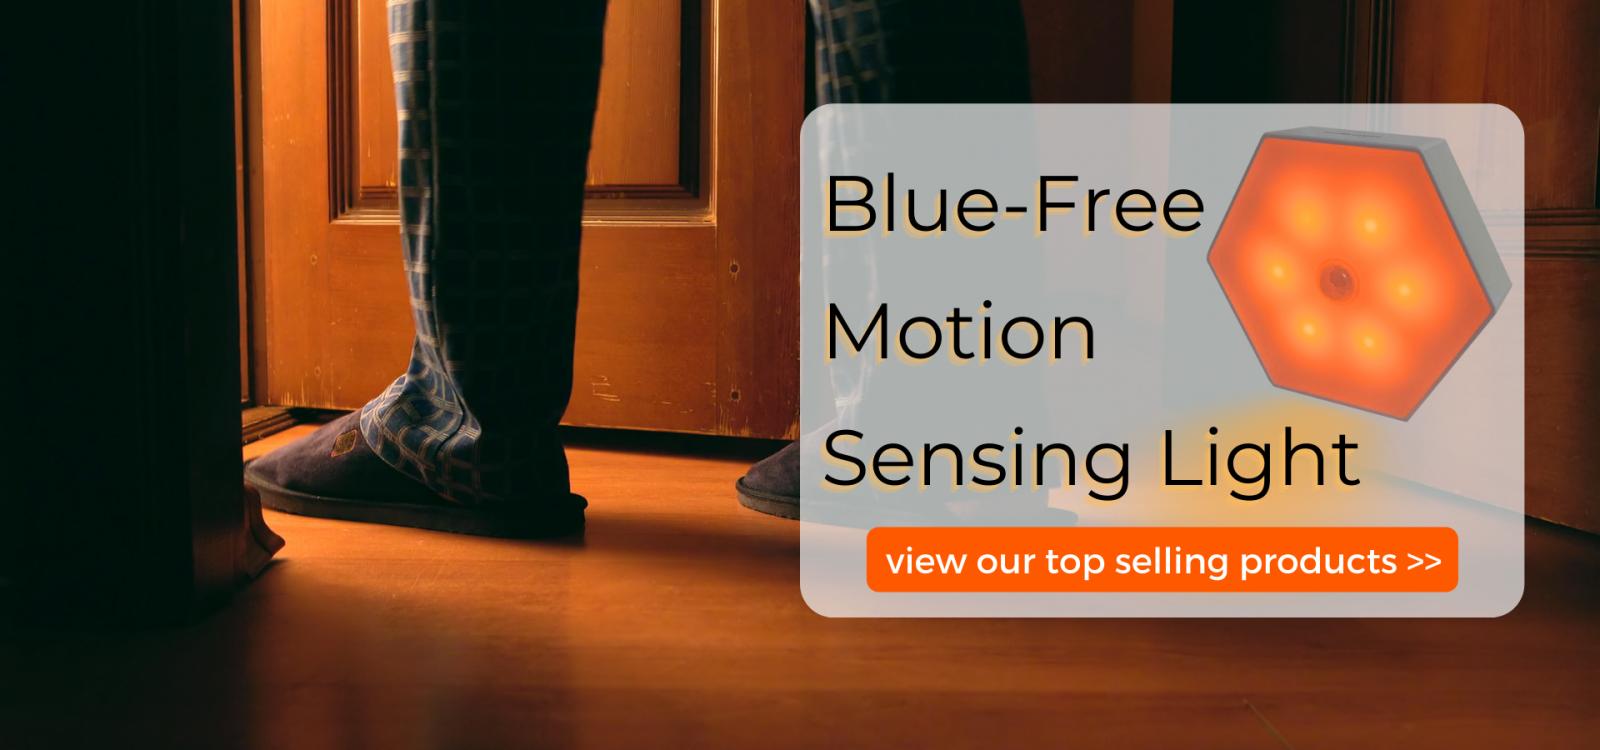 Blue-free motion sensing light